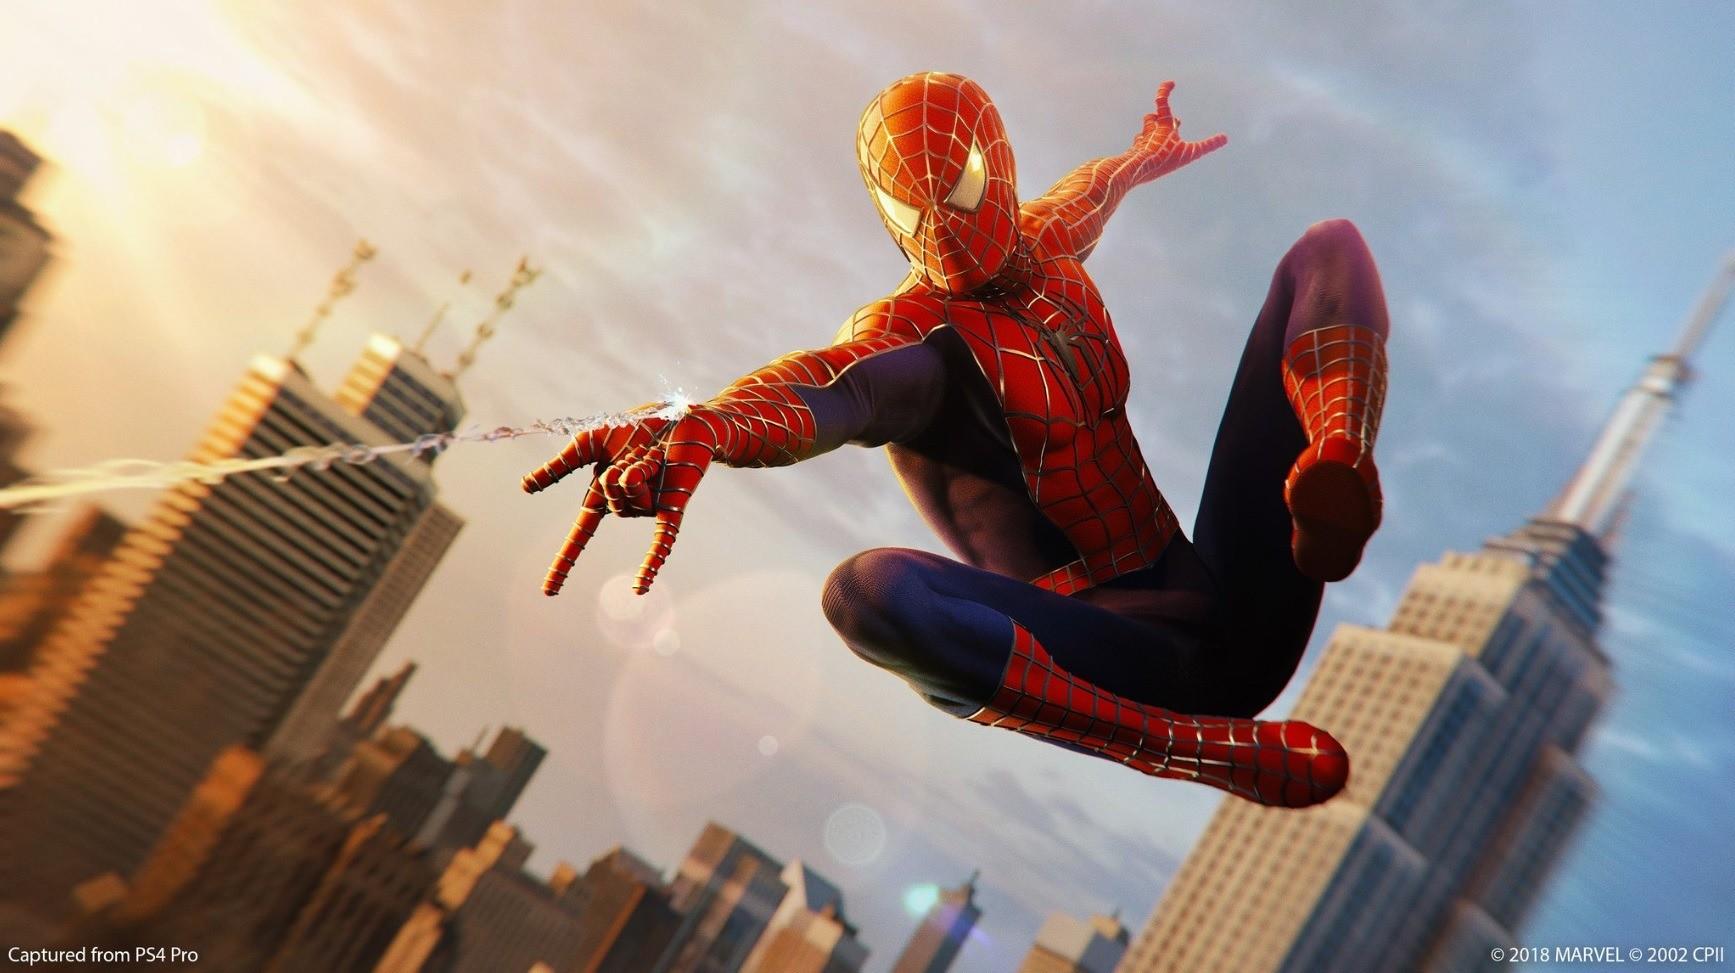 Obrázok z hry Marvel's Spider-Man na PlayStation 4